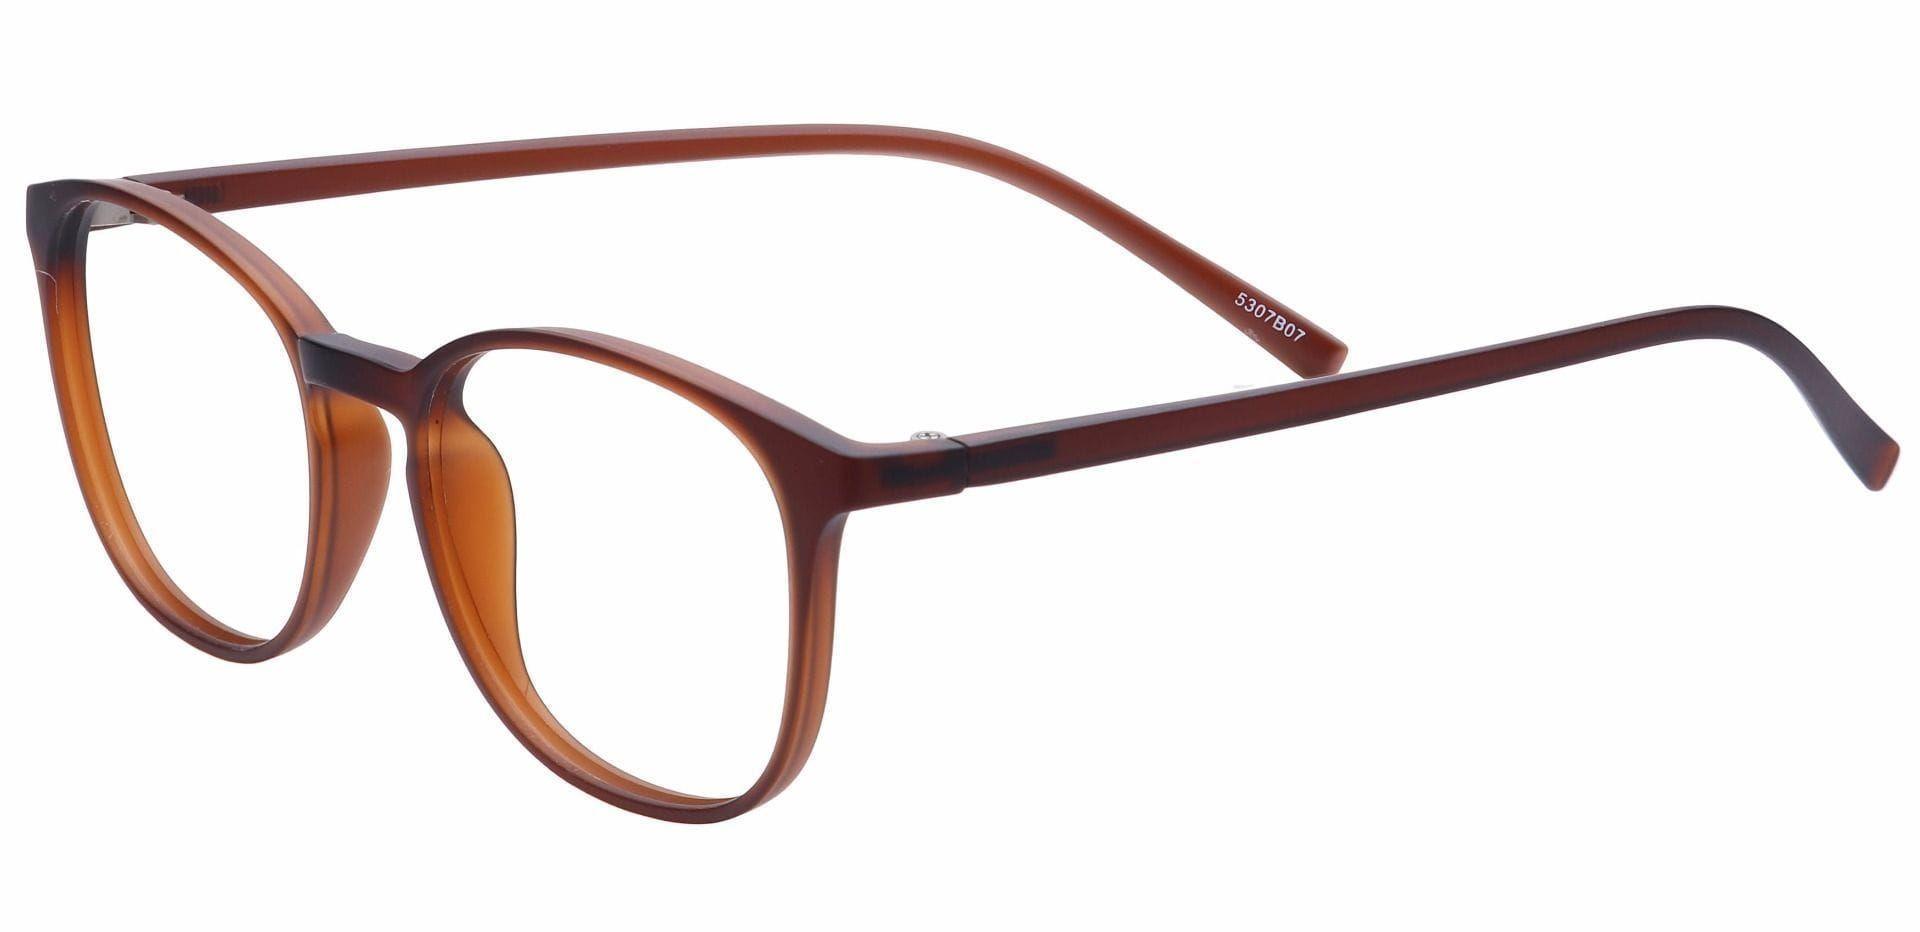 Hip Oval Prescription Glasses - Brown